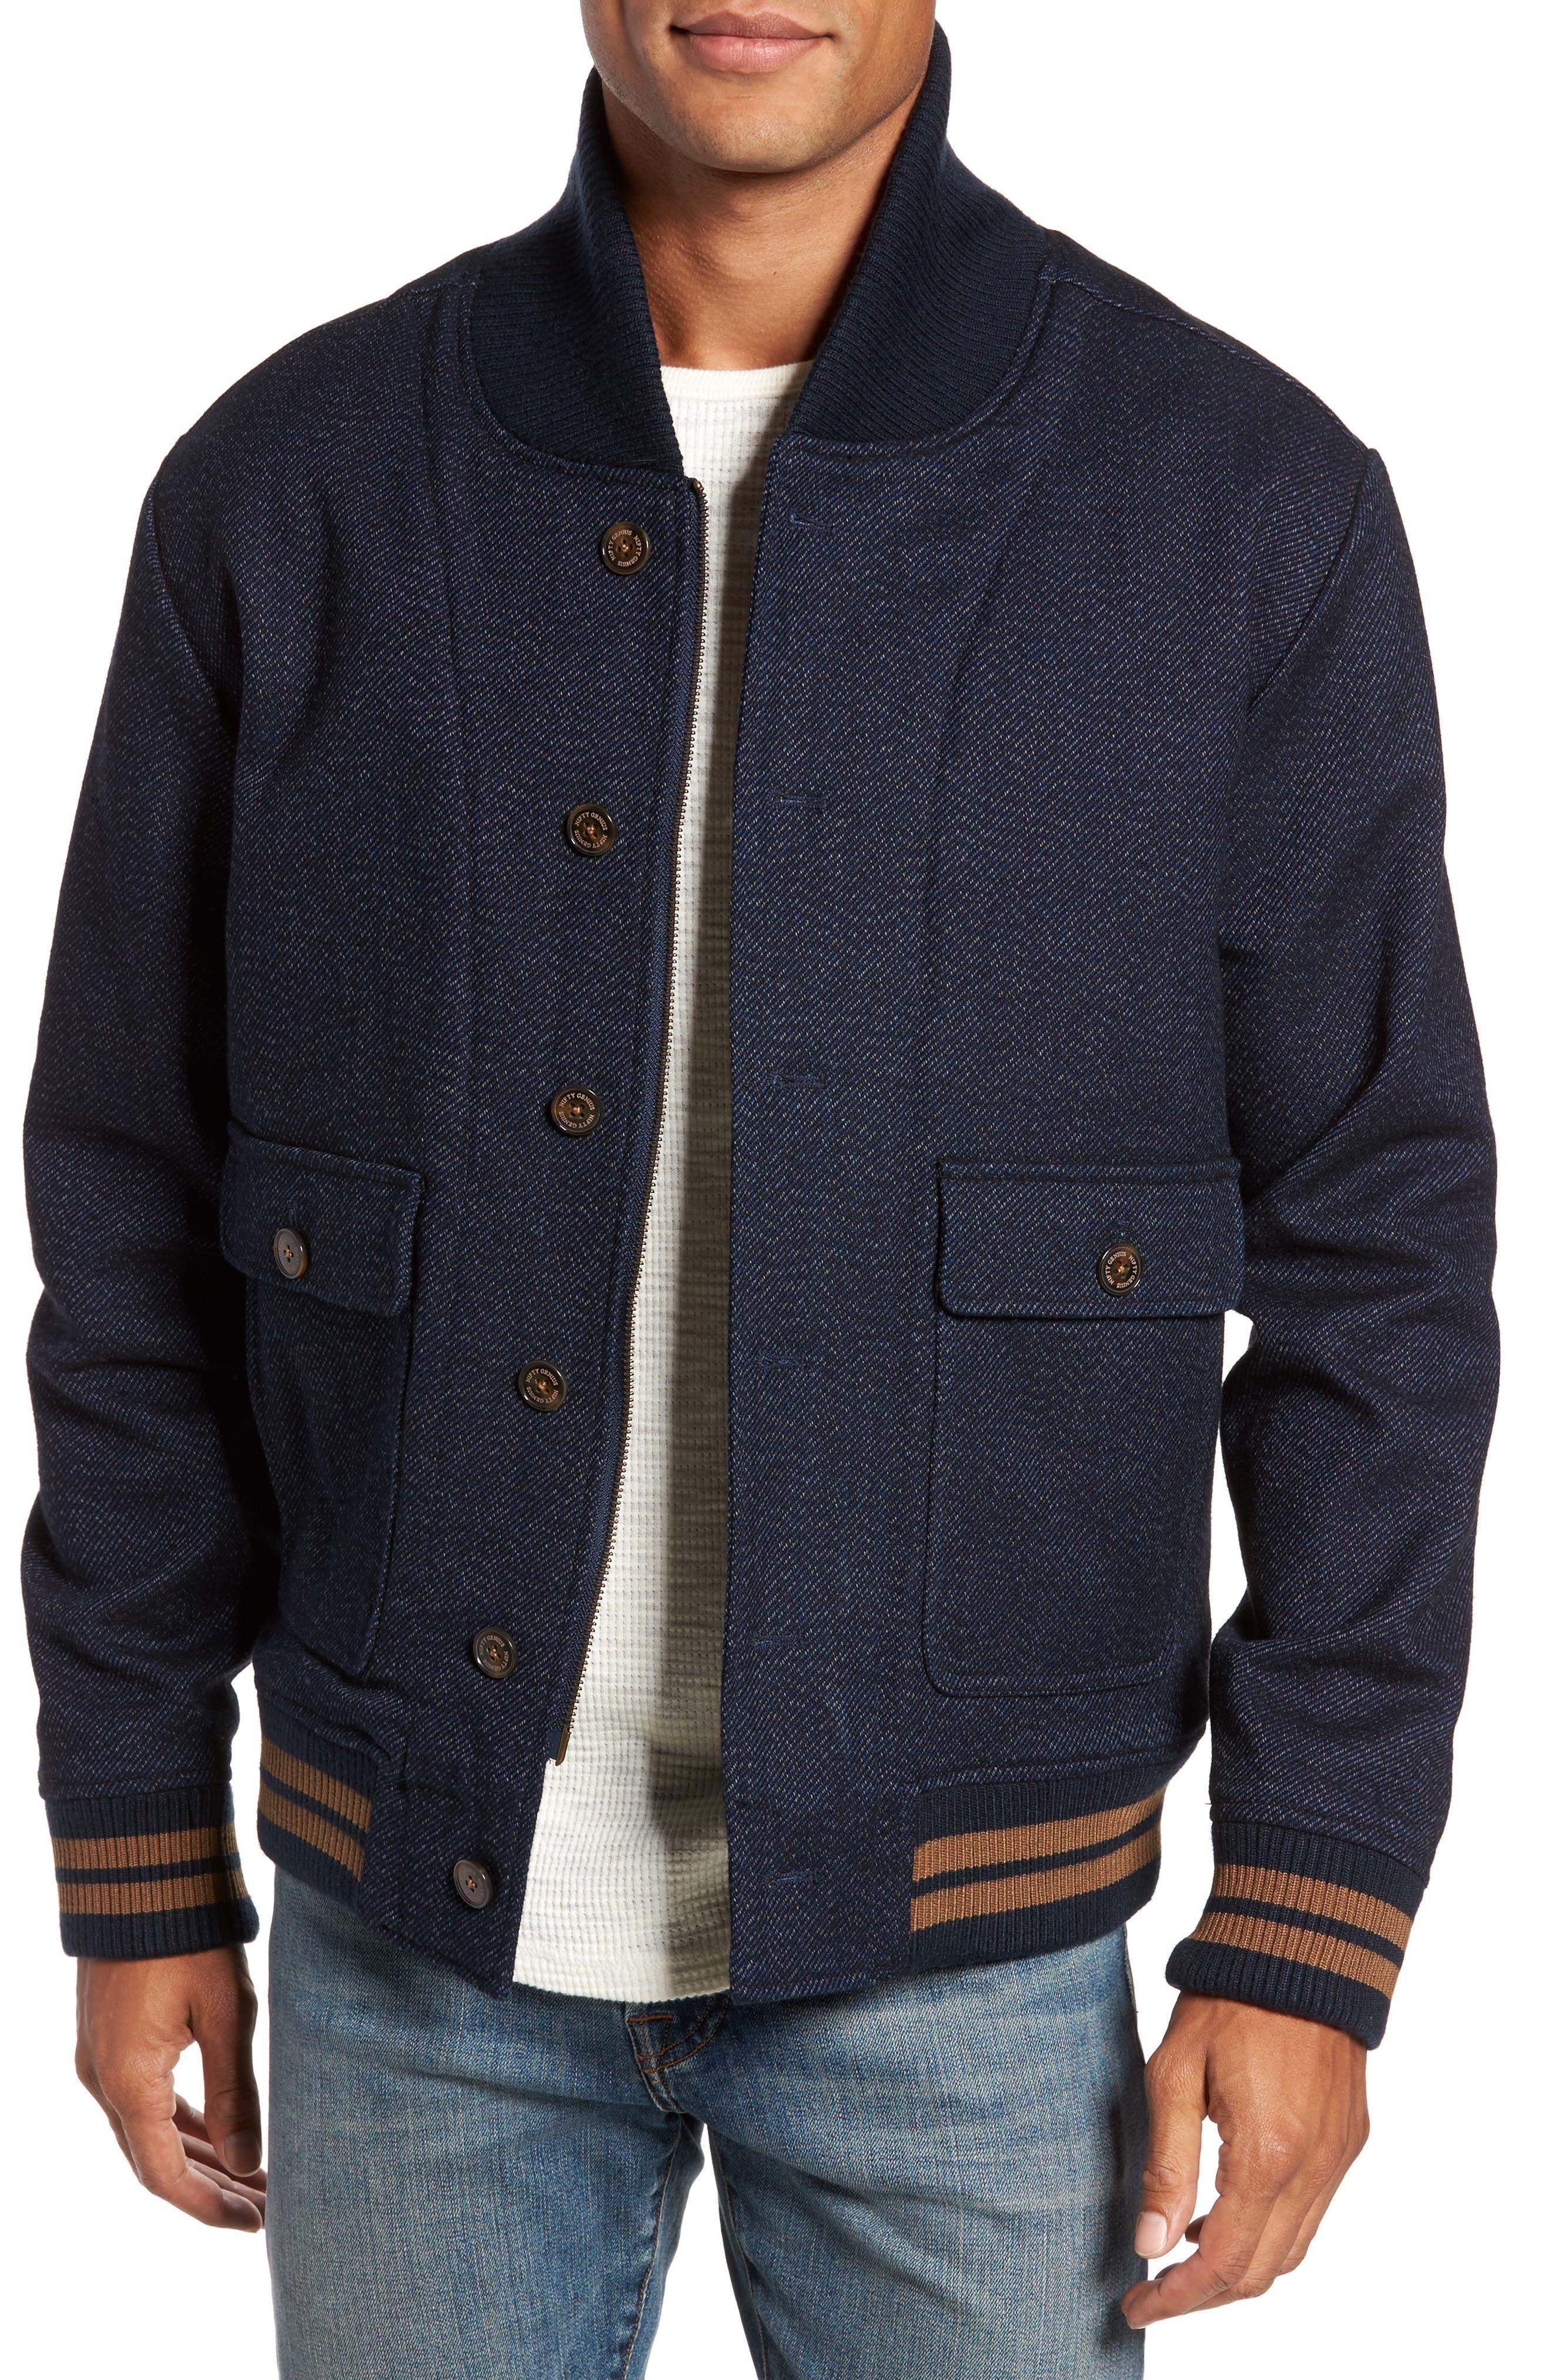 Roll Collar Varsity Jacket,                         Main,                         color, 401